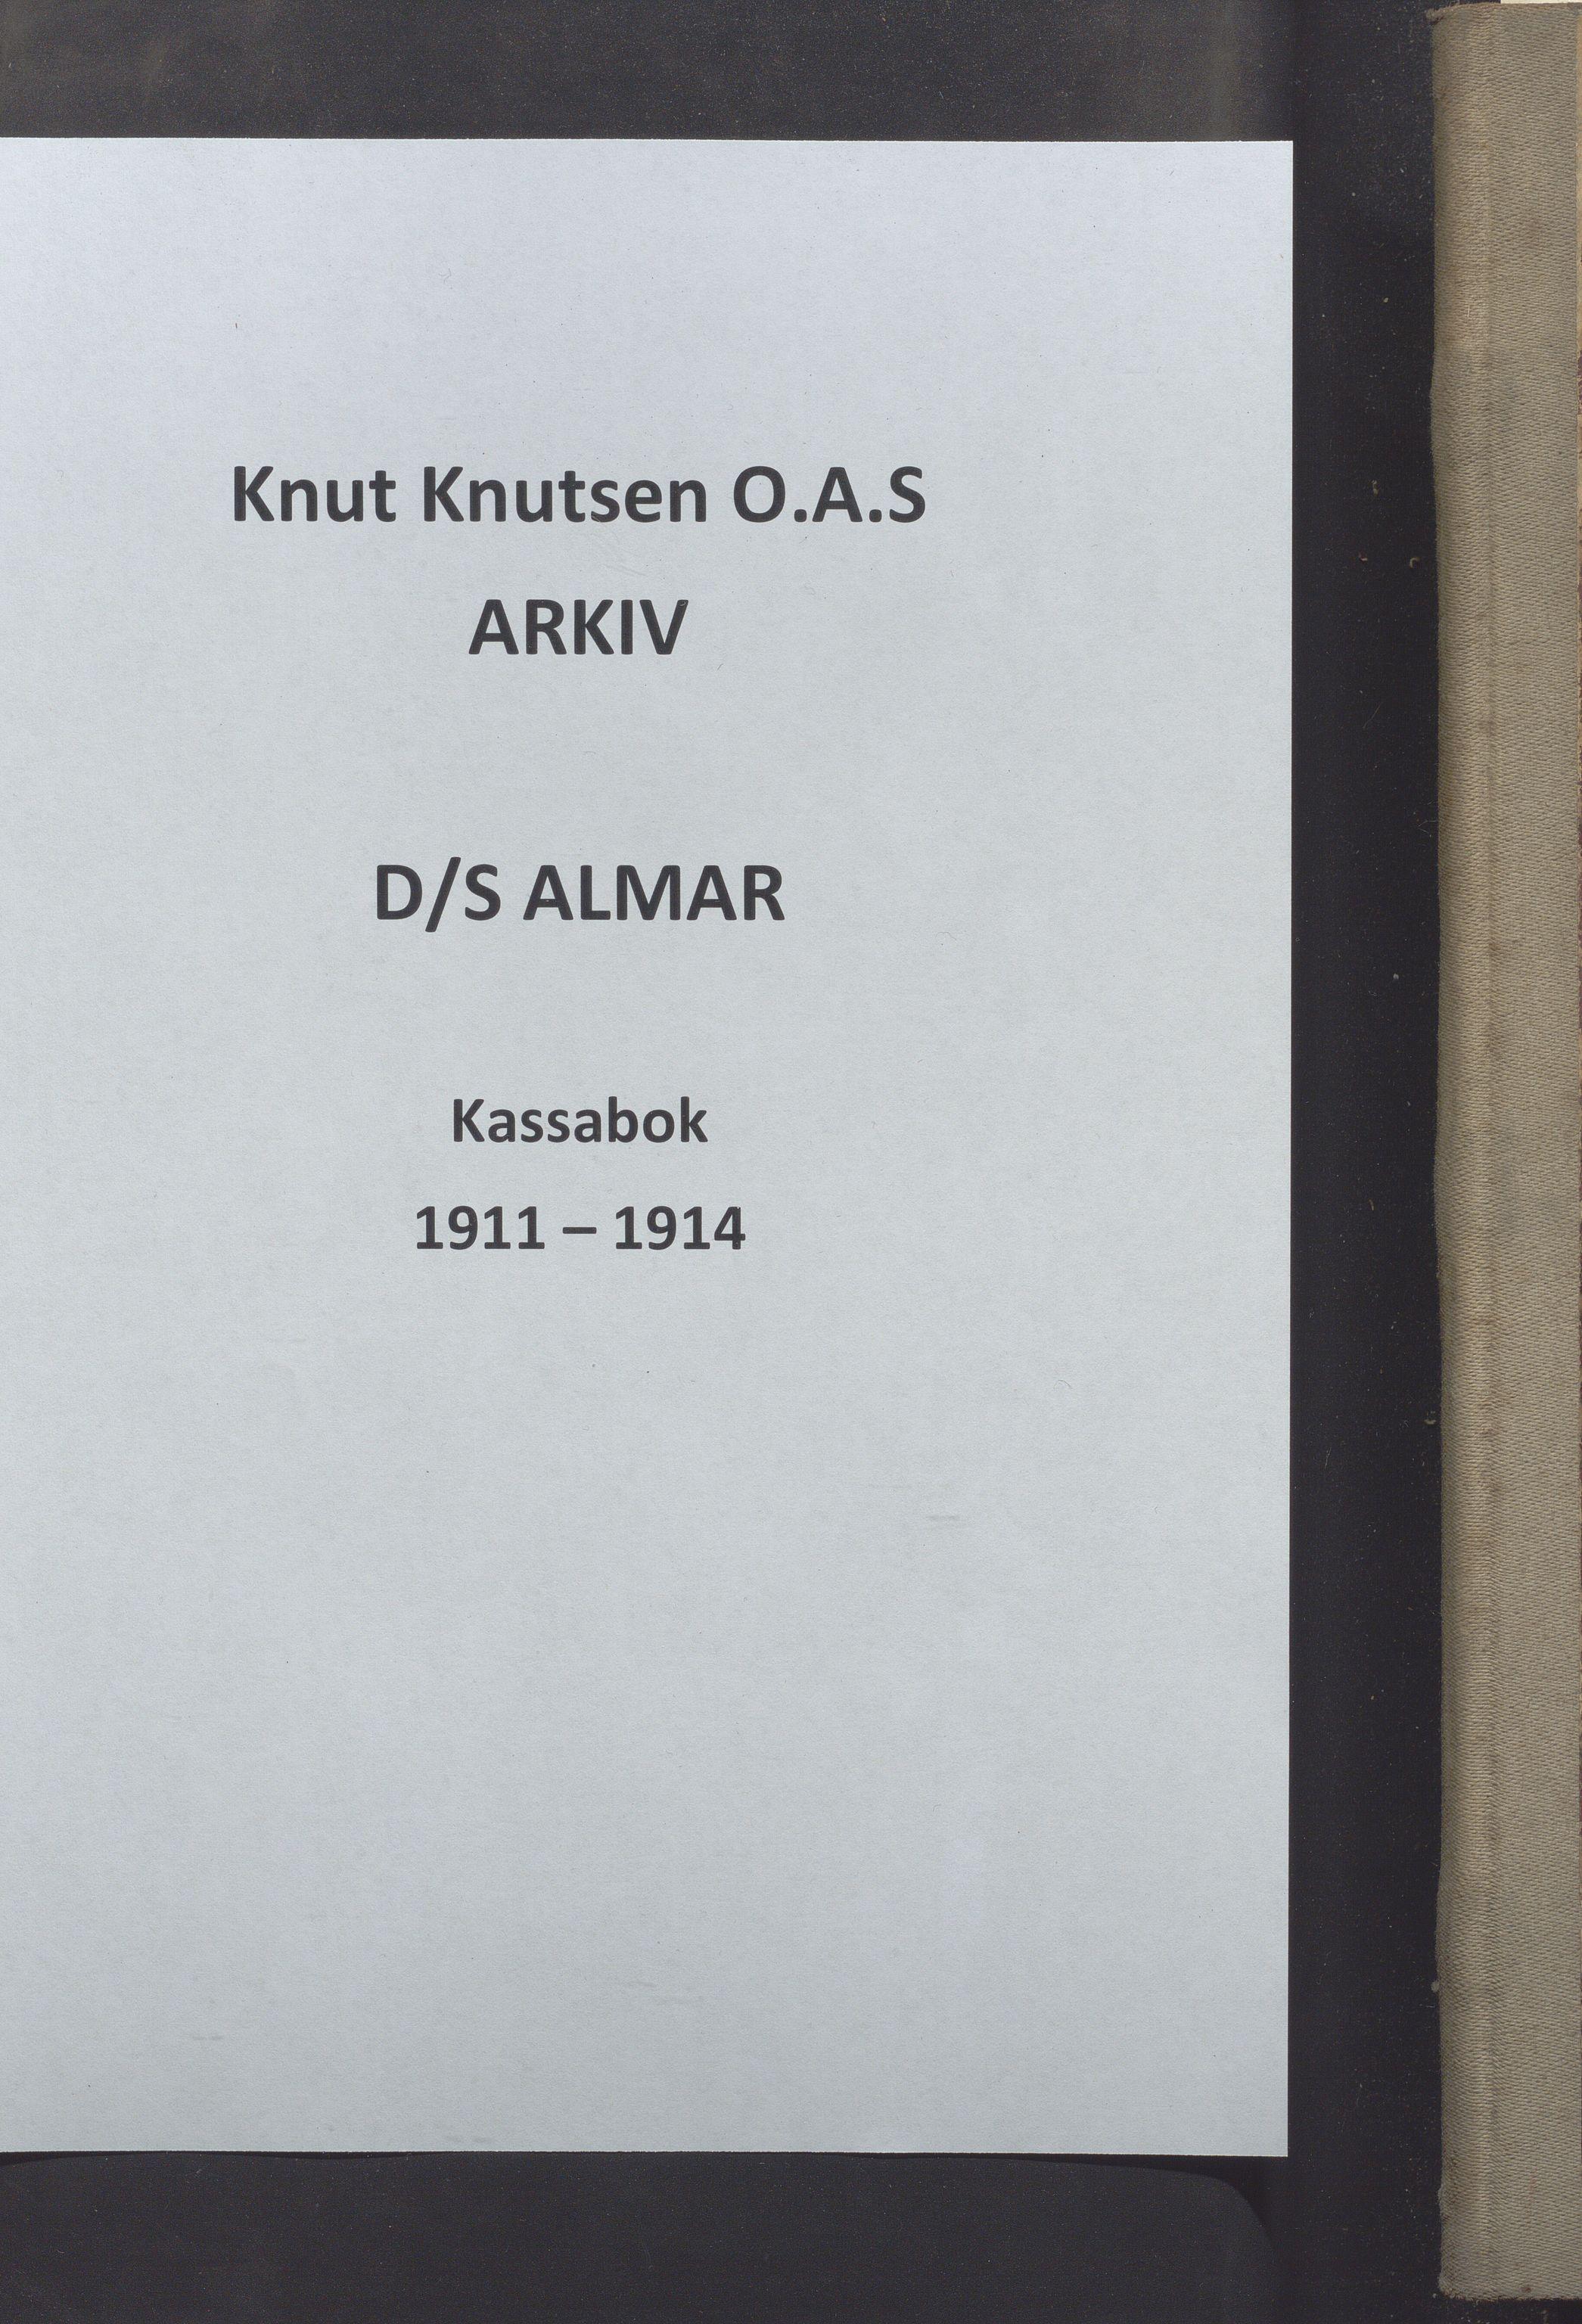 HABI, Knut Knutsen O.A.S., 1911-1914